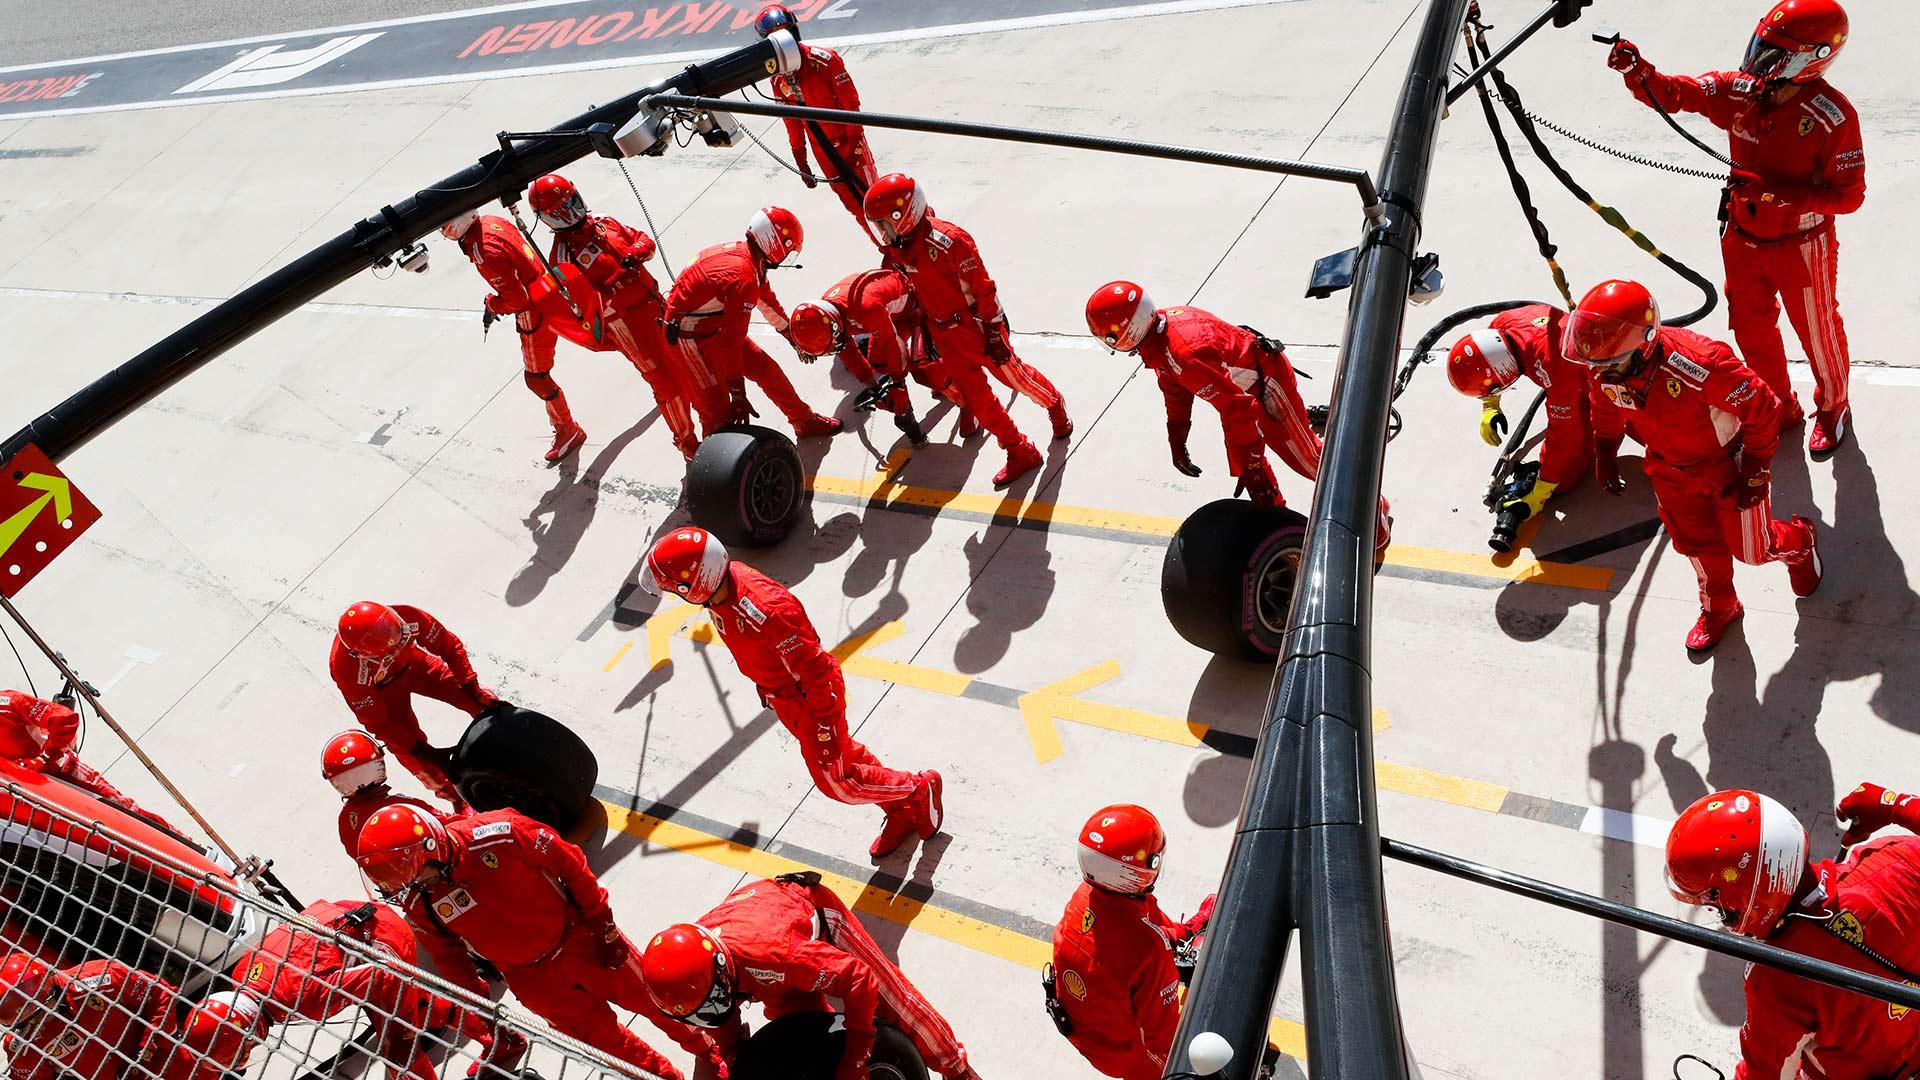 Five Reasons to Attend the Portuguese Grand Prix